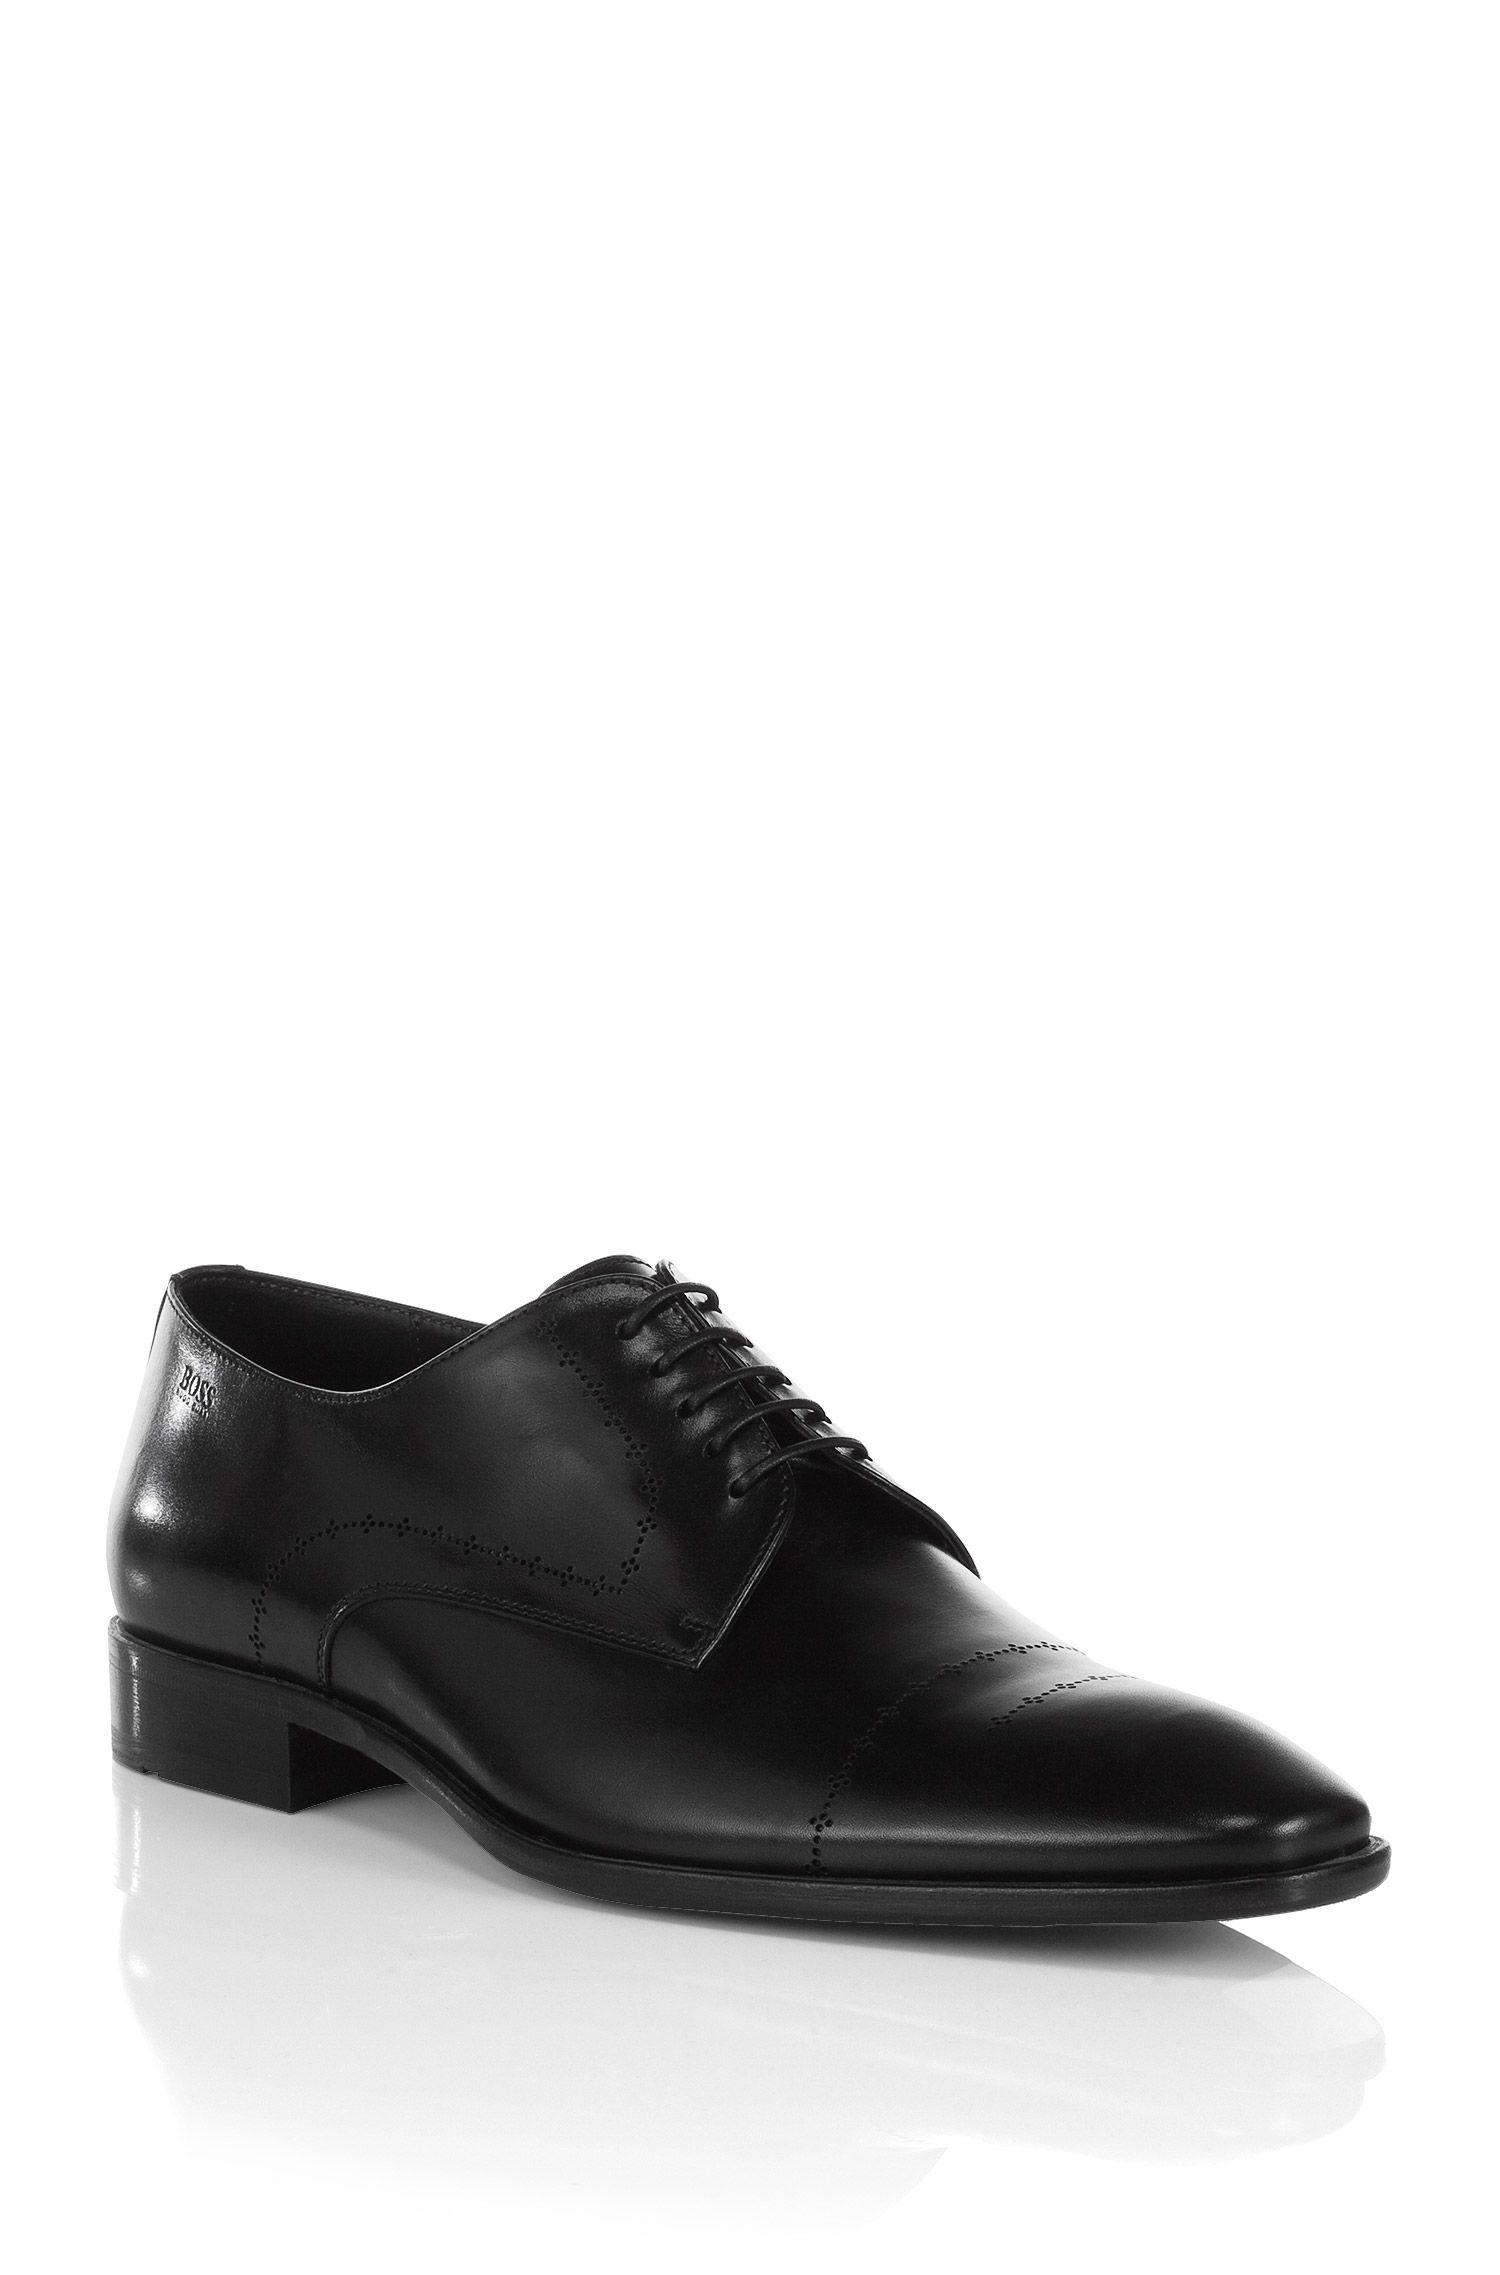 Business-Schuh ´Cerber` mit Lyra-Lochung